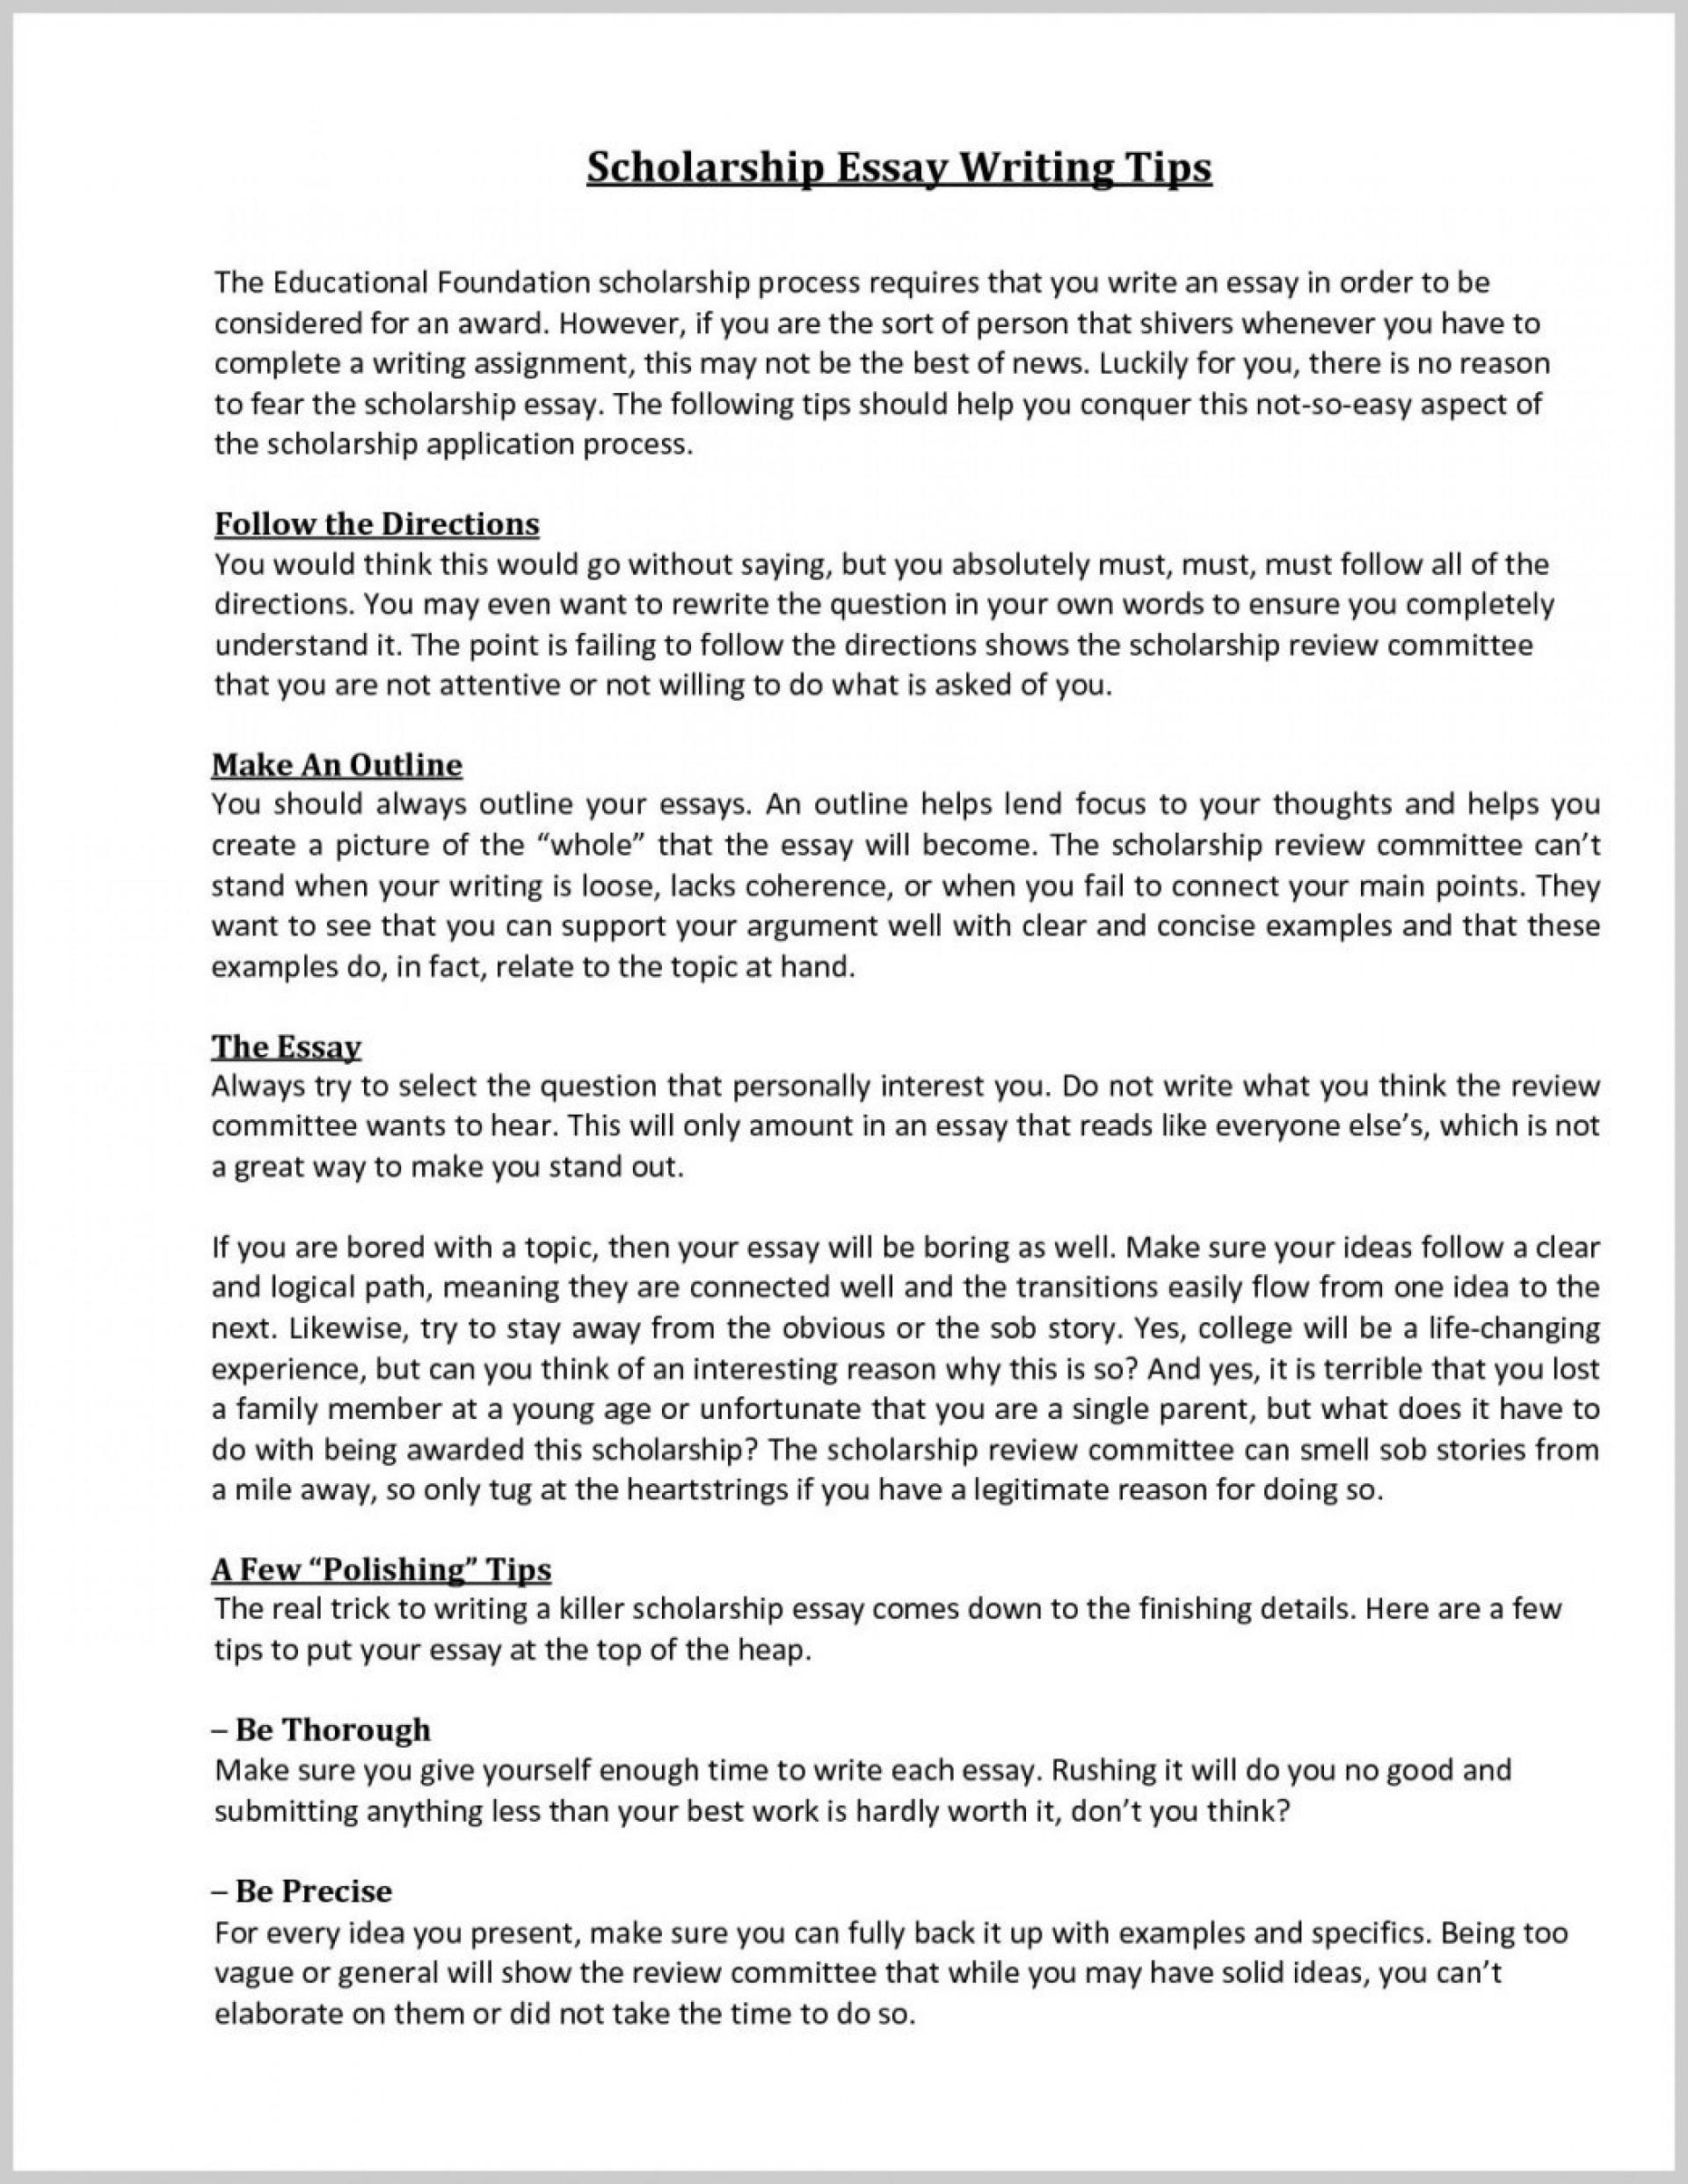 003 Showcase My Attitude Towards Money Essay Resume Ideas I Want To Write Essays For On Happiness Brave New W 1048x1356 Best University High School Reddit 1920